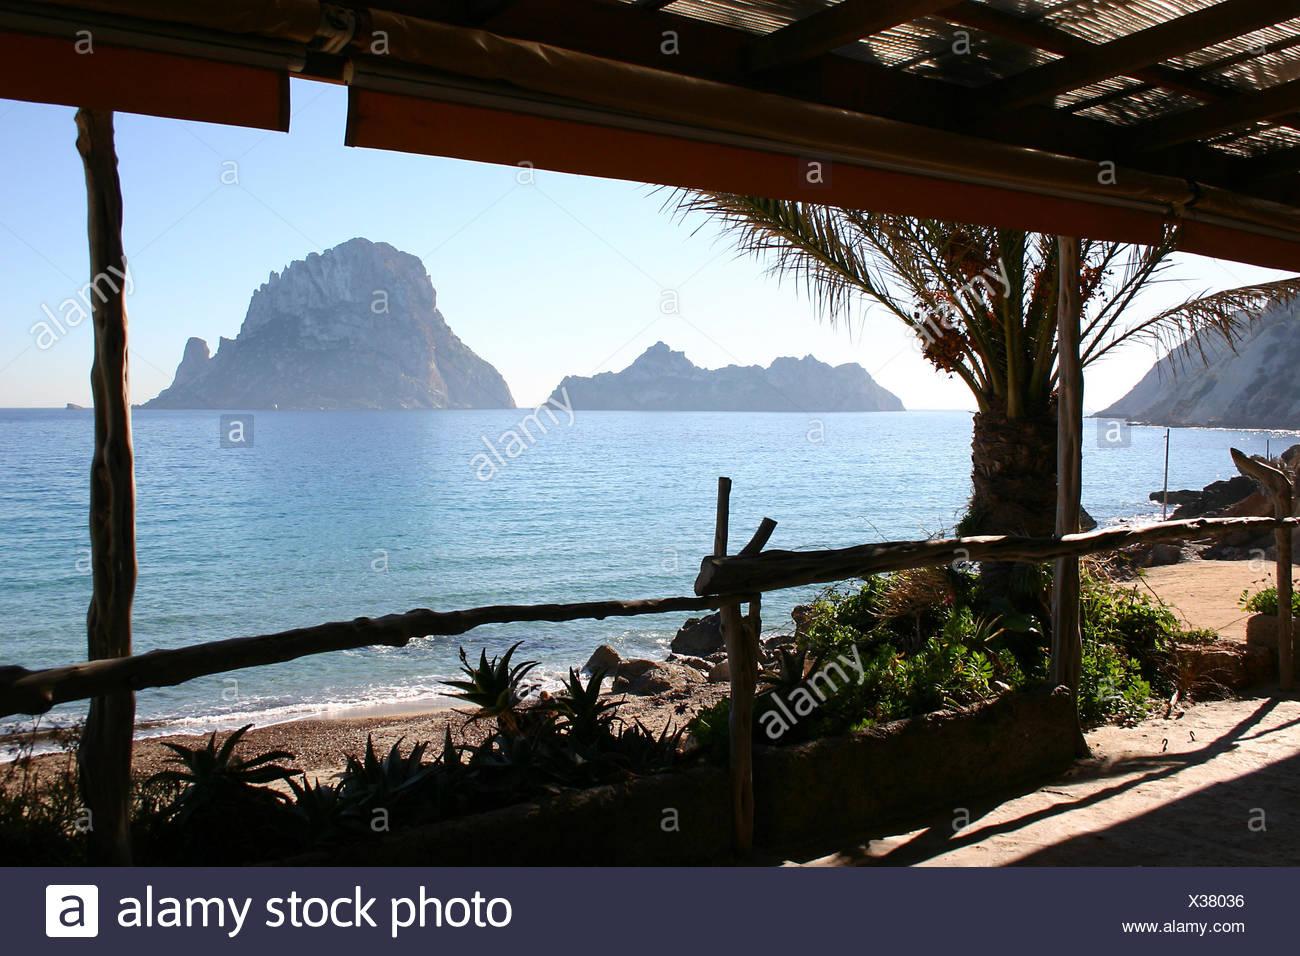 spain nature-sanctuary myths it isle island vedra ibiza spain baleareninsel - Stock Image